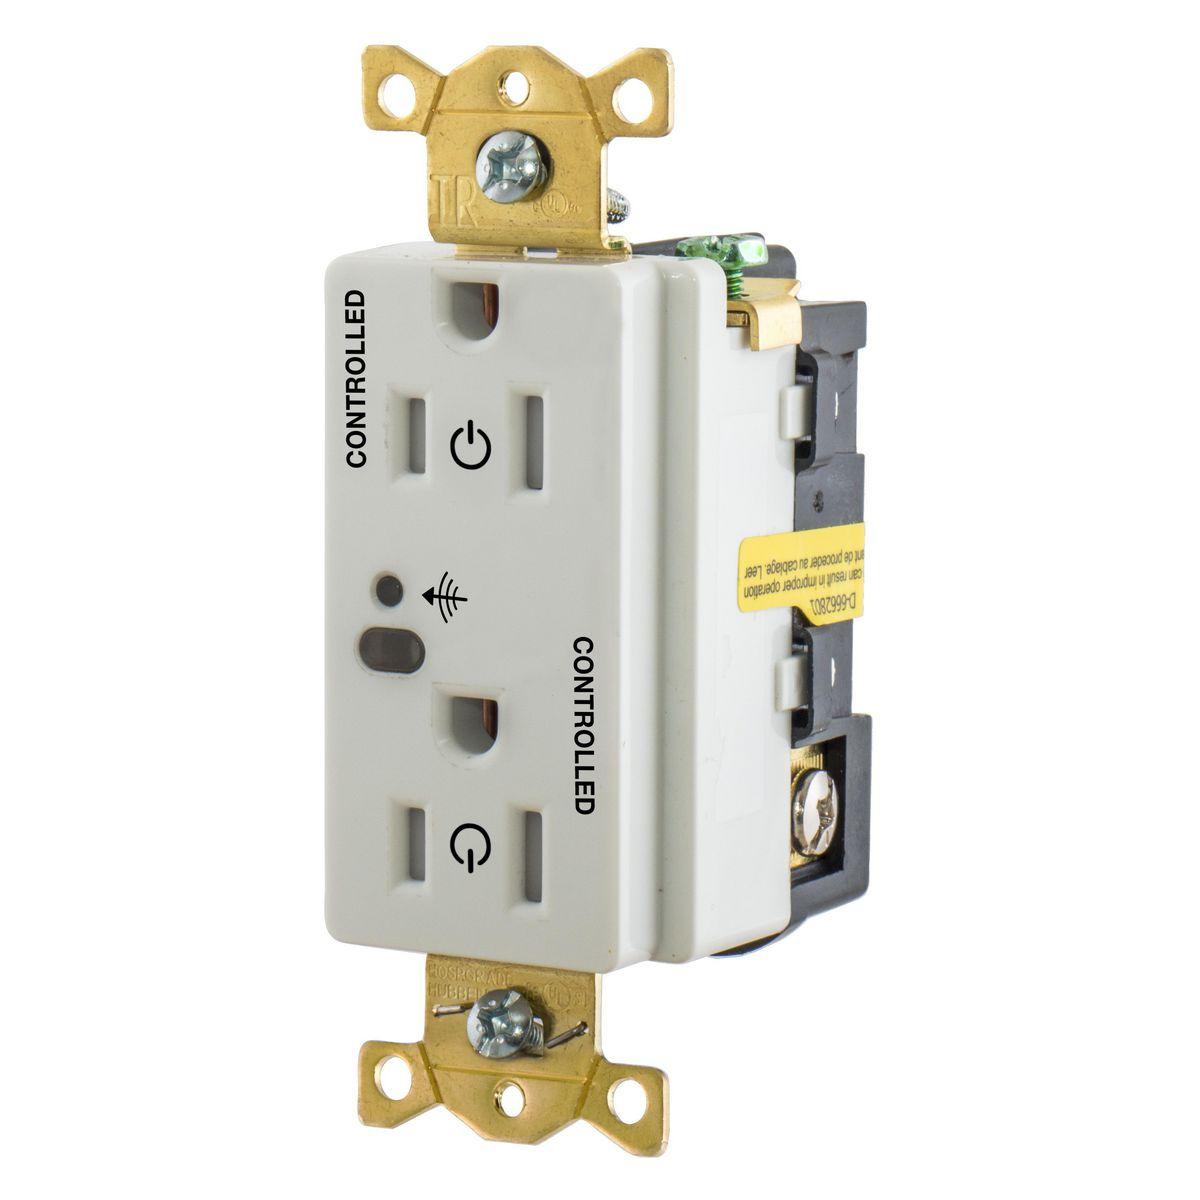 HBL5262RFC2GN | Automatic Receptacle Control | Lighting Controls ...